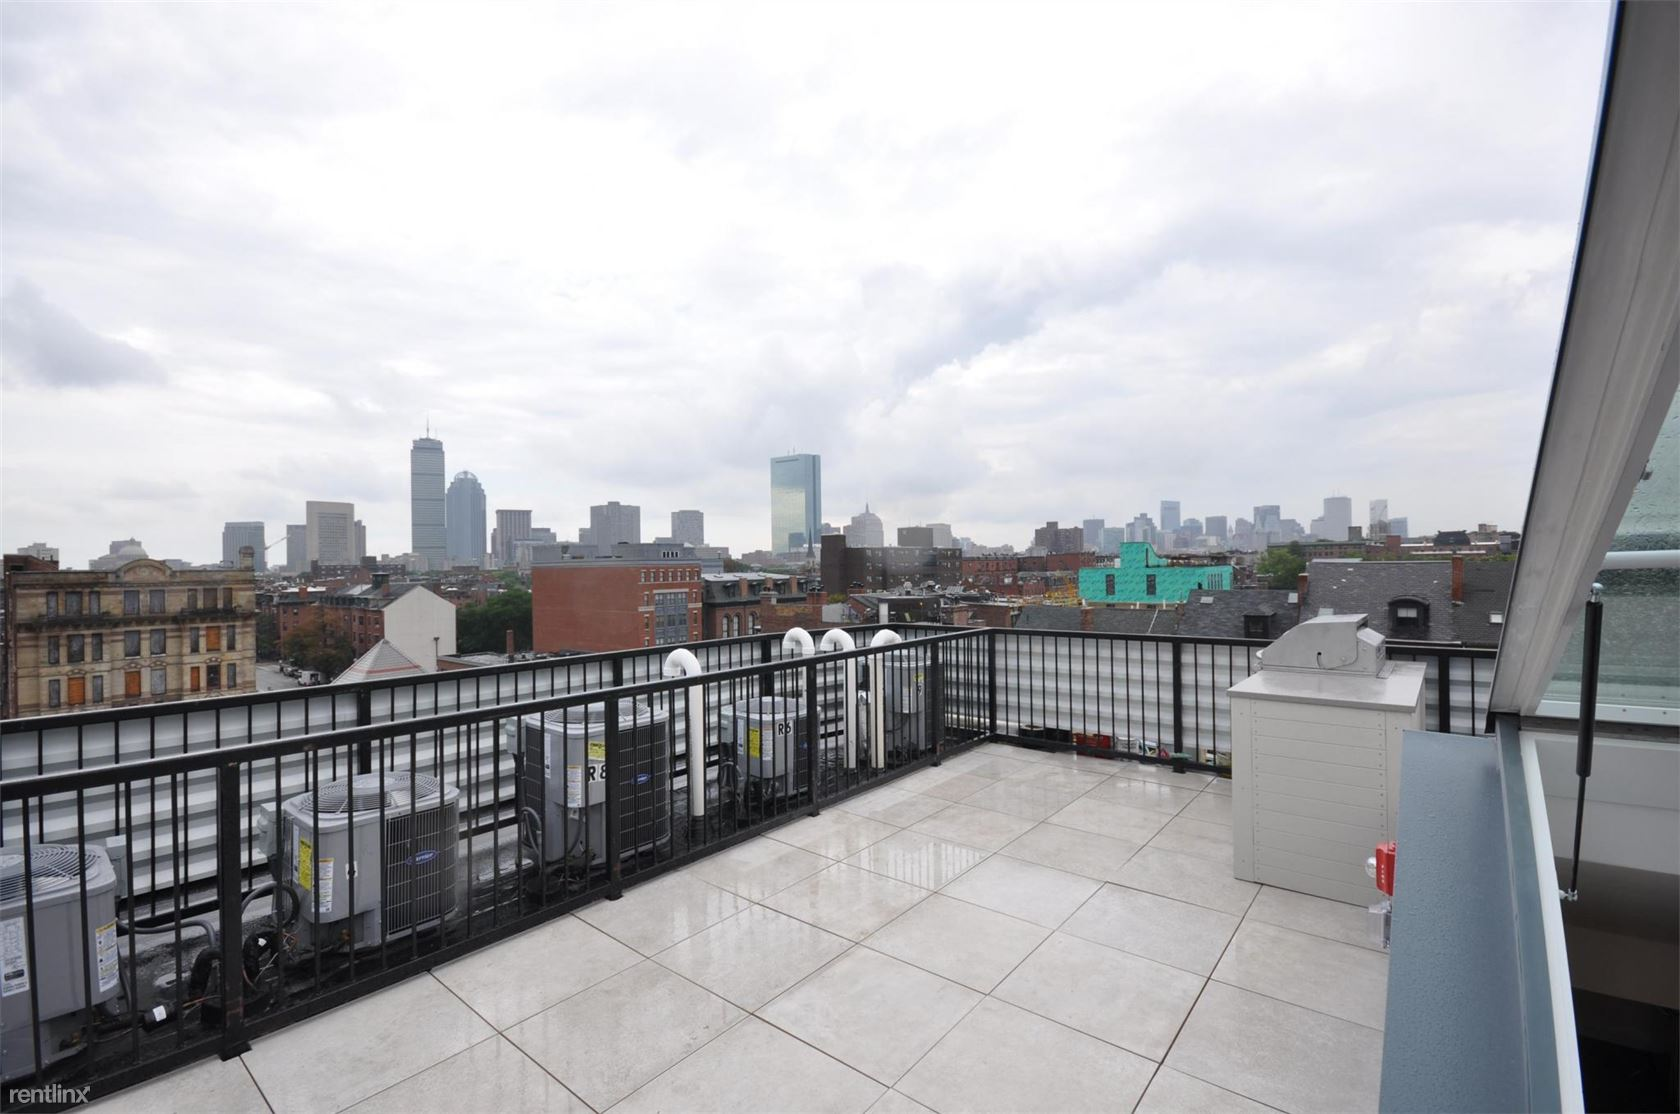 659 Massachusetts Ave Apt 9A, Boston, MA - $4,100 USD/ month